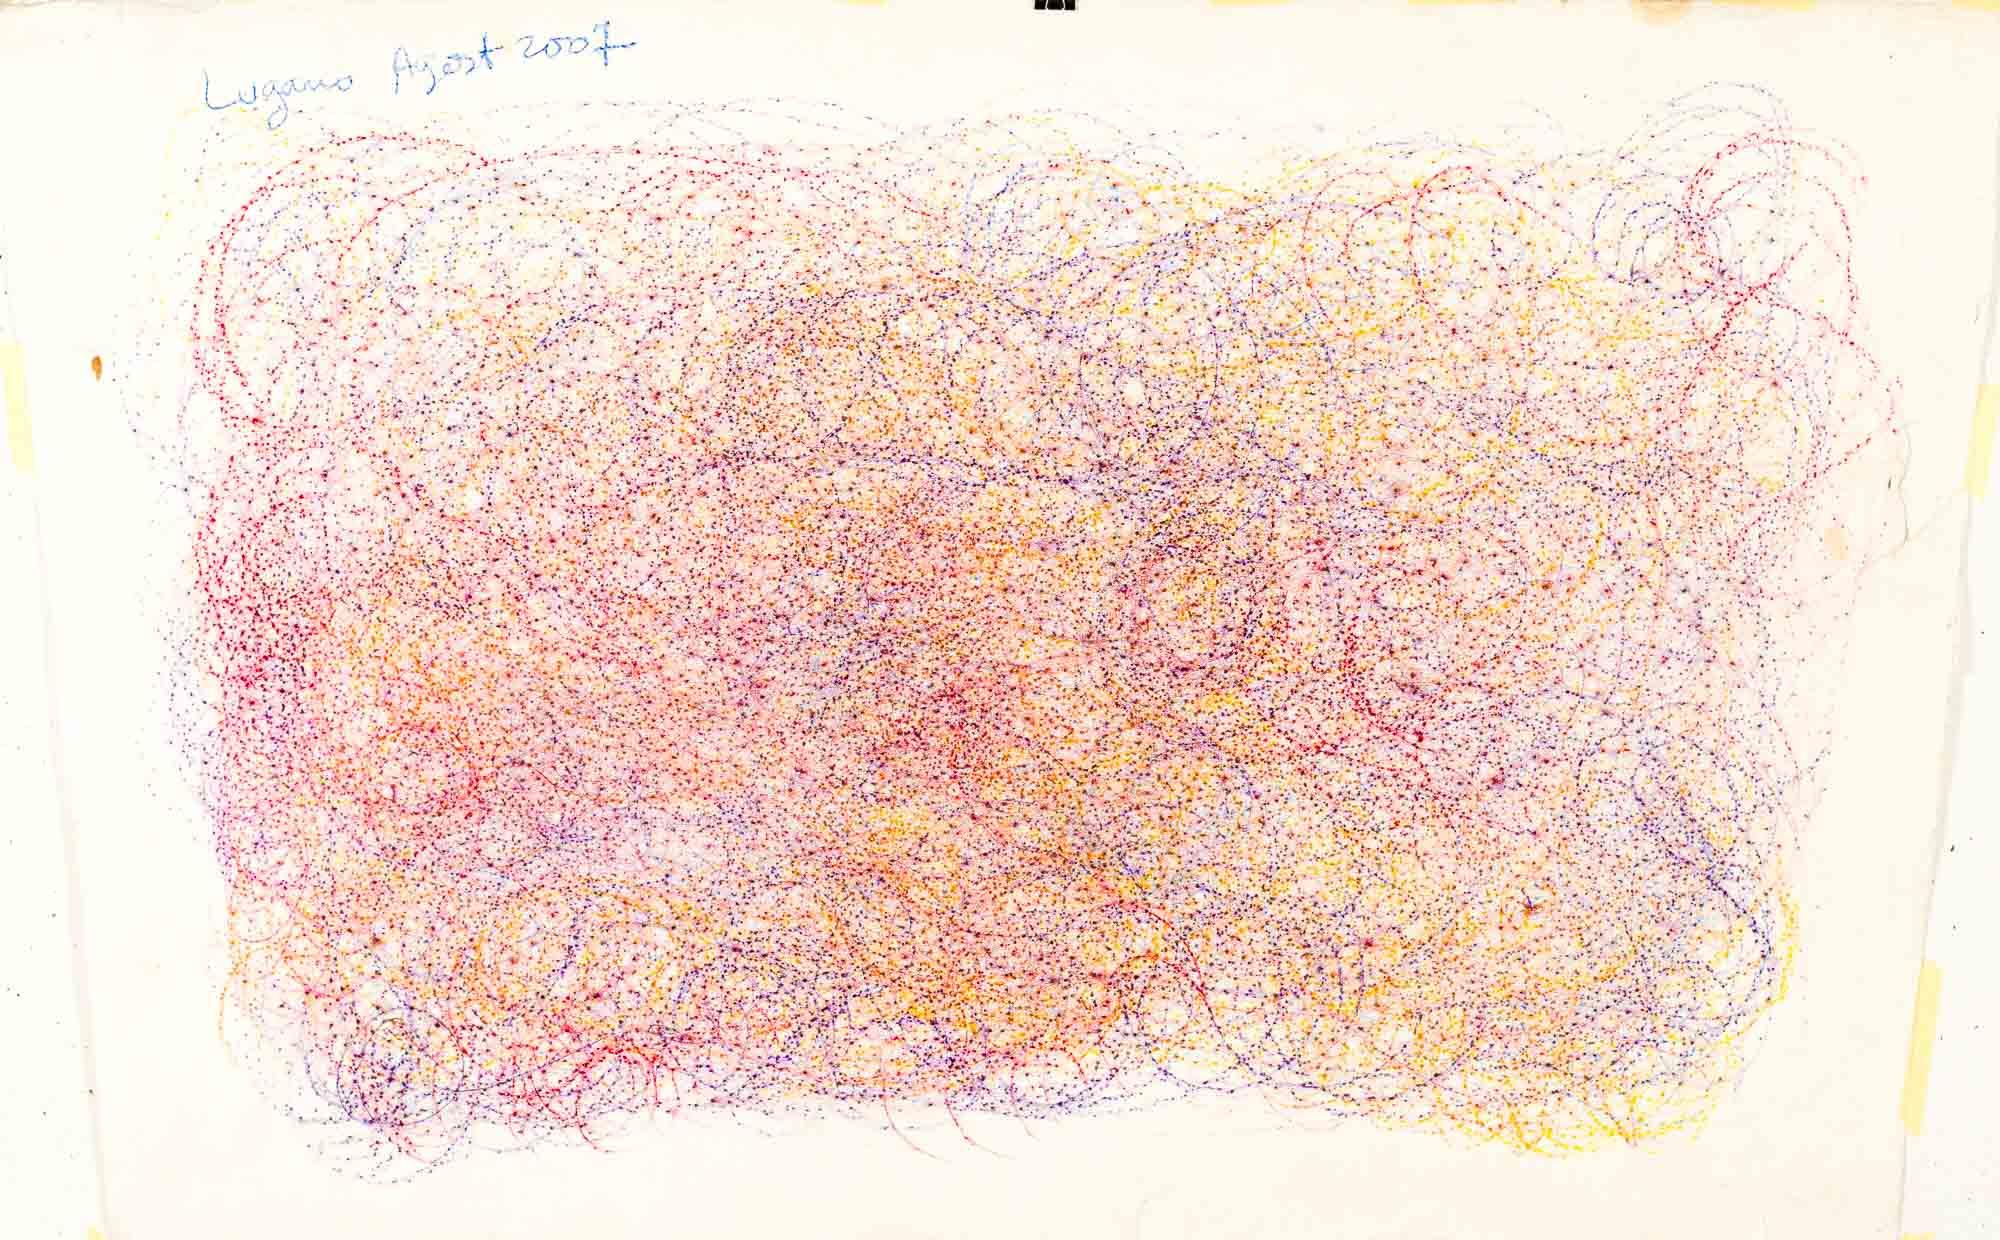 SW1_Ignacio Guisasola, Bienenkunst-4417 x 2738-LR-Jonas.jpg